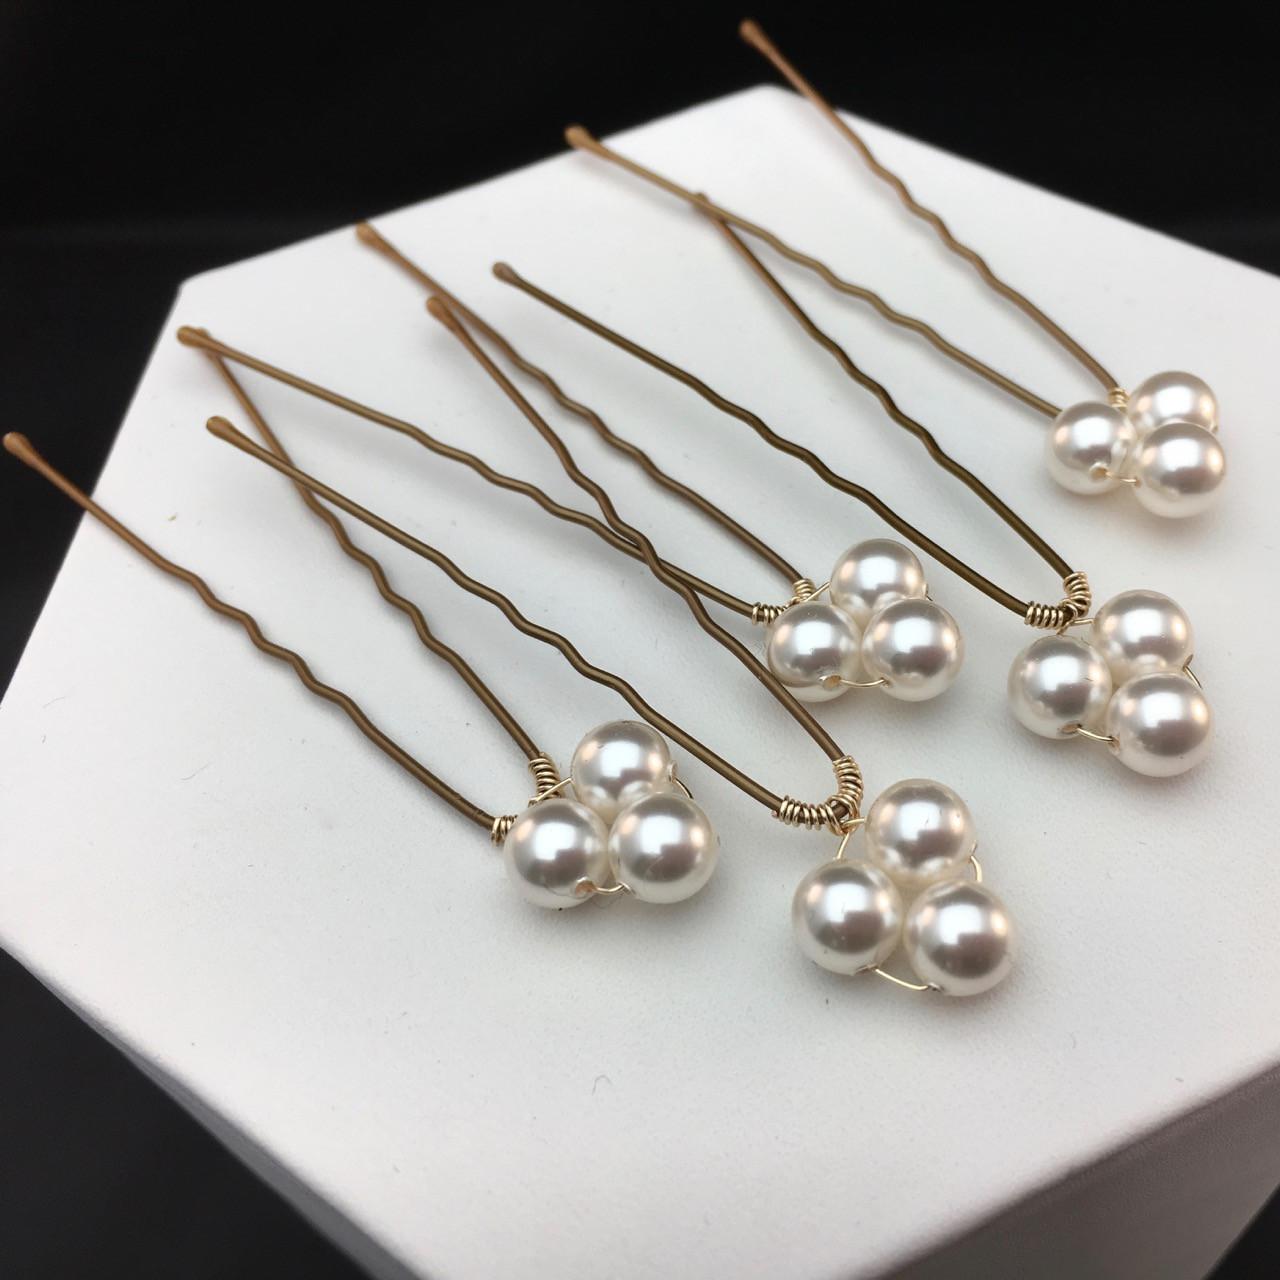 0ec7776ceecd17 6mm Swarovski pearl trio hair pins - set of 4 - SMH Jewelry